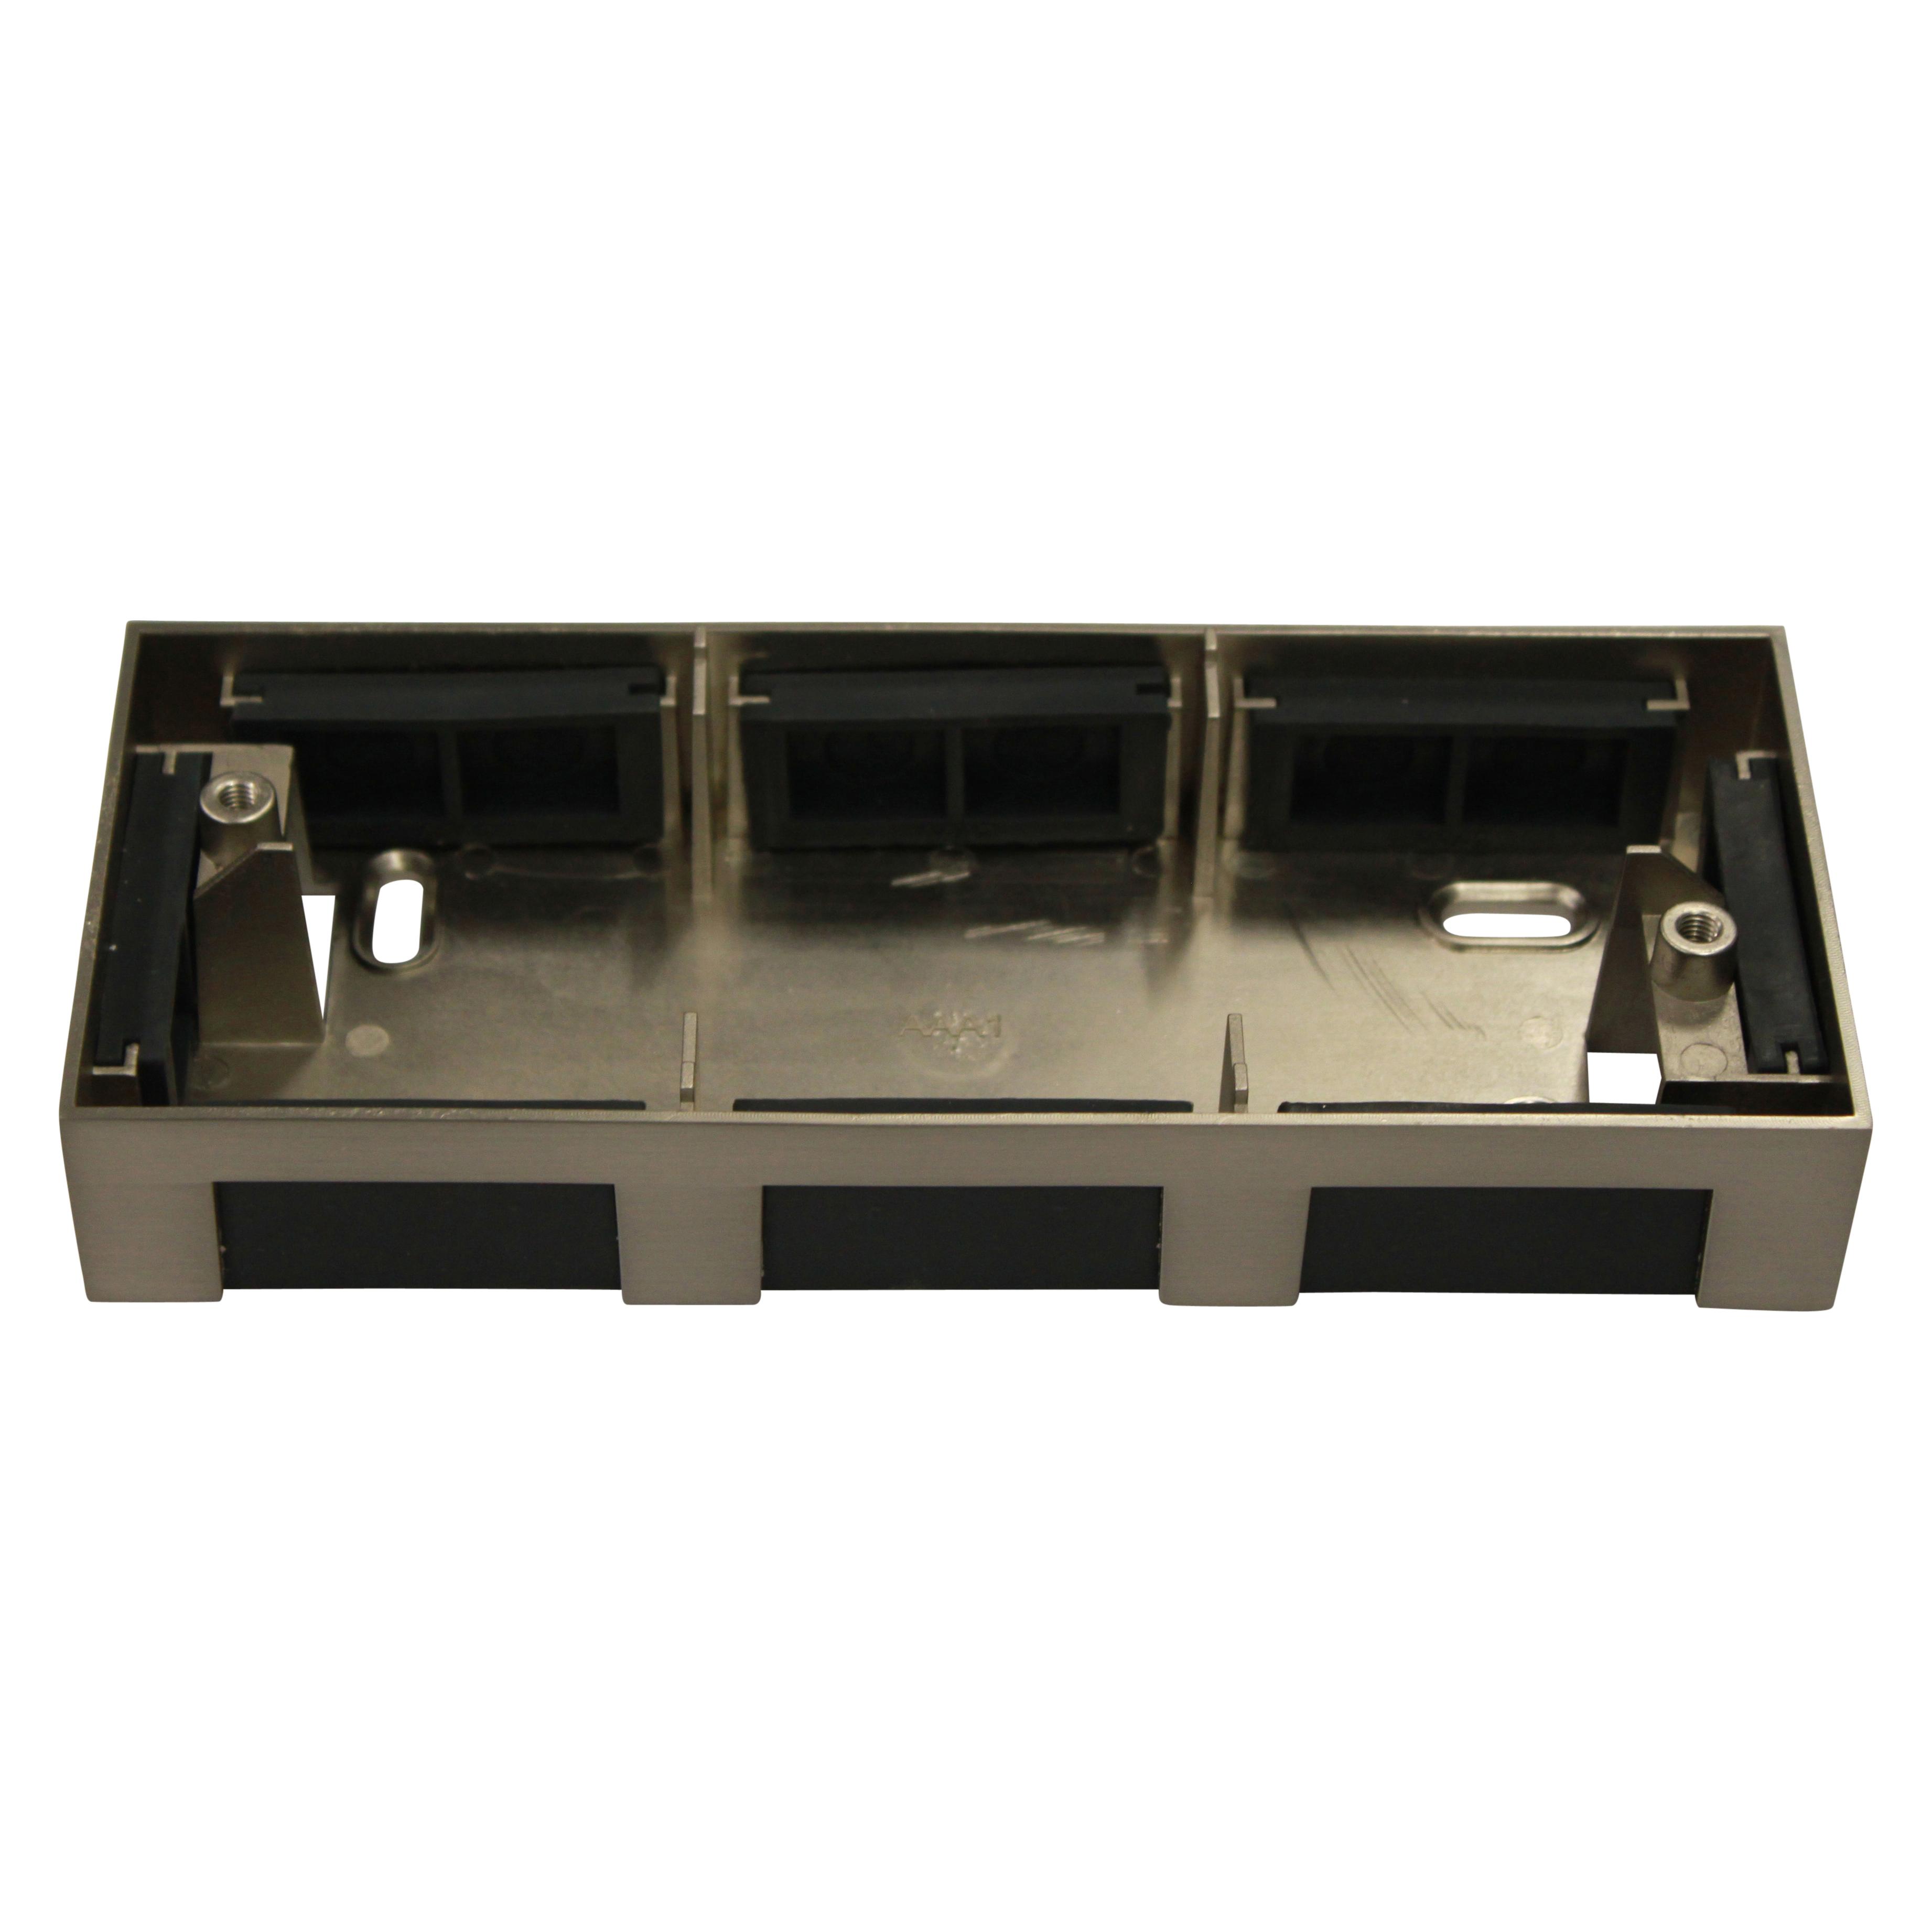 1 Stk Anbauadapter fü�r Notleuchten Design AM/AX Edelstahl Optik NLAMAXAPAE